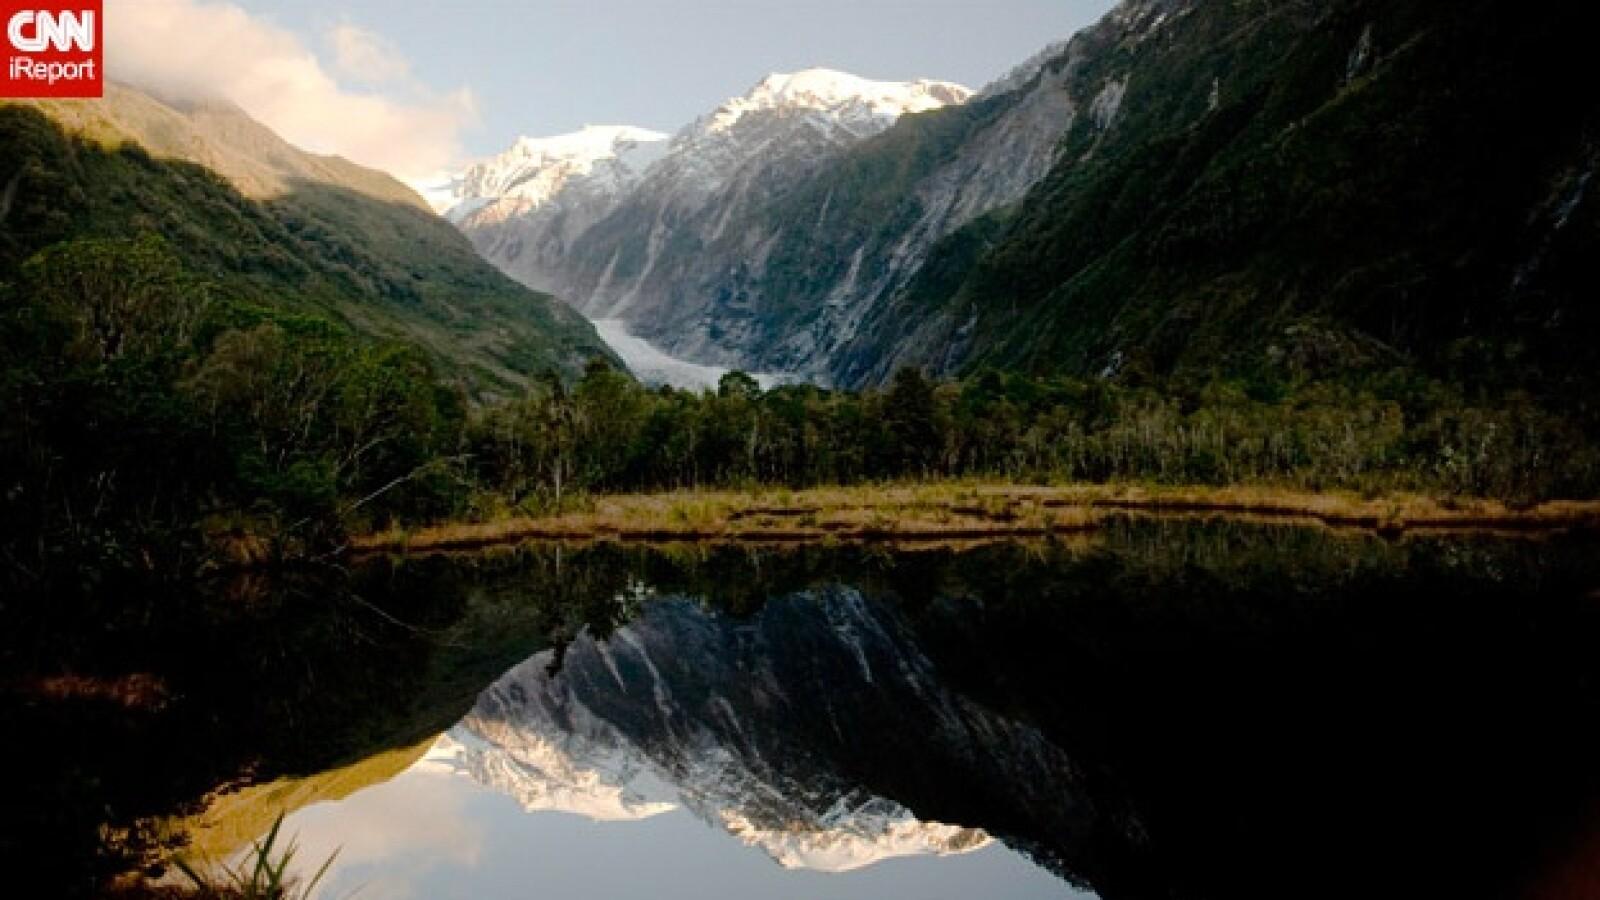 nueva zelandia ireport viajes destinos europa 13